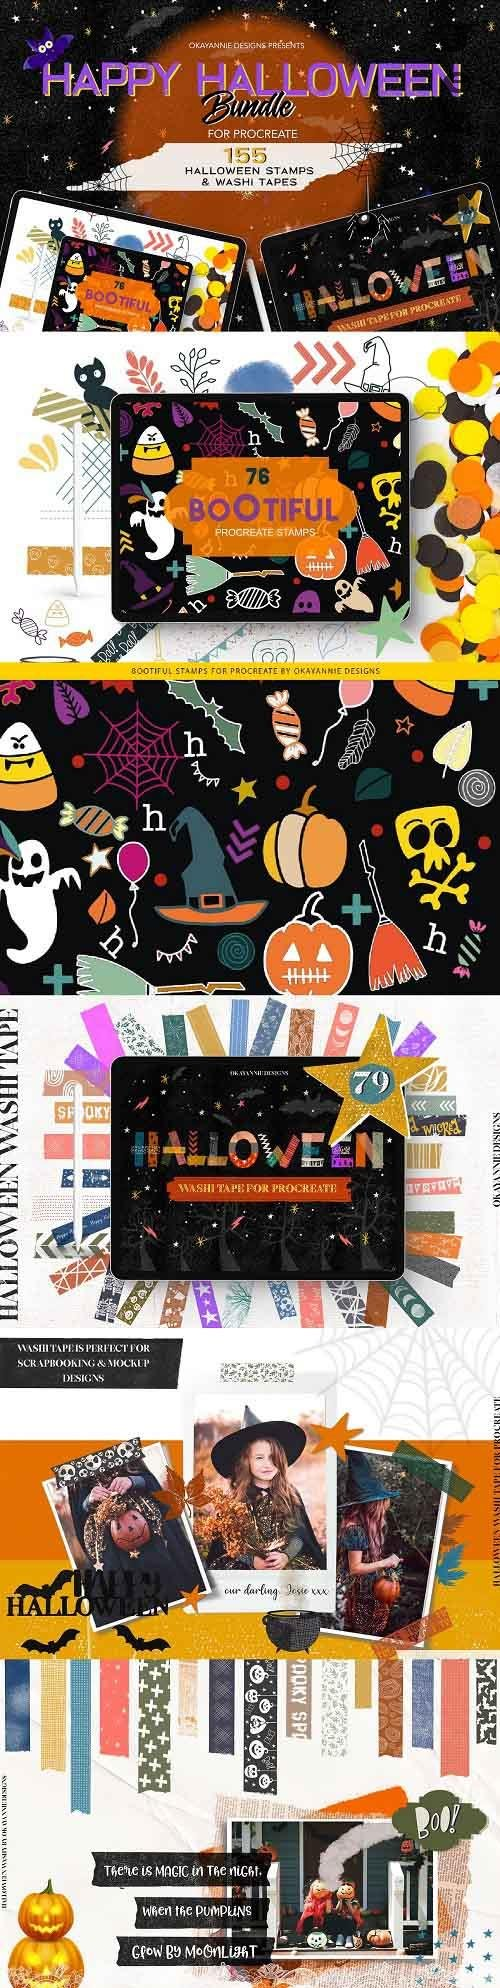 Happy Halloween Procreate Bundle - 5503420